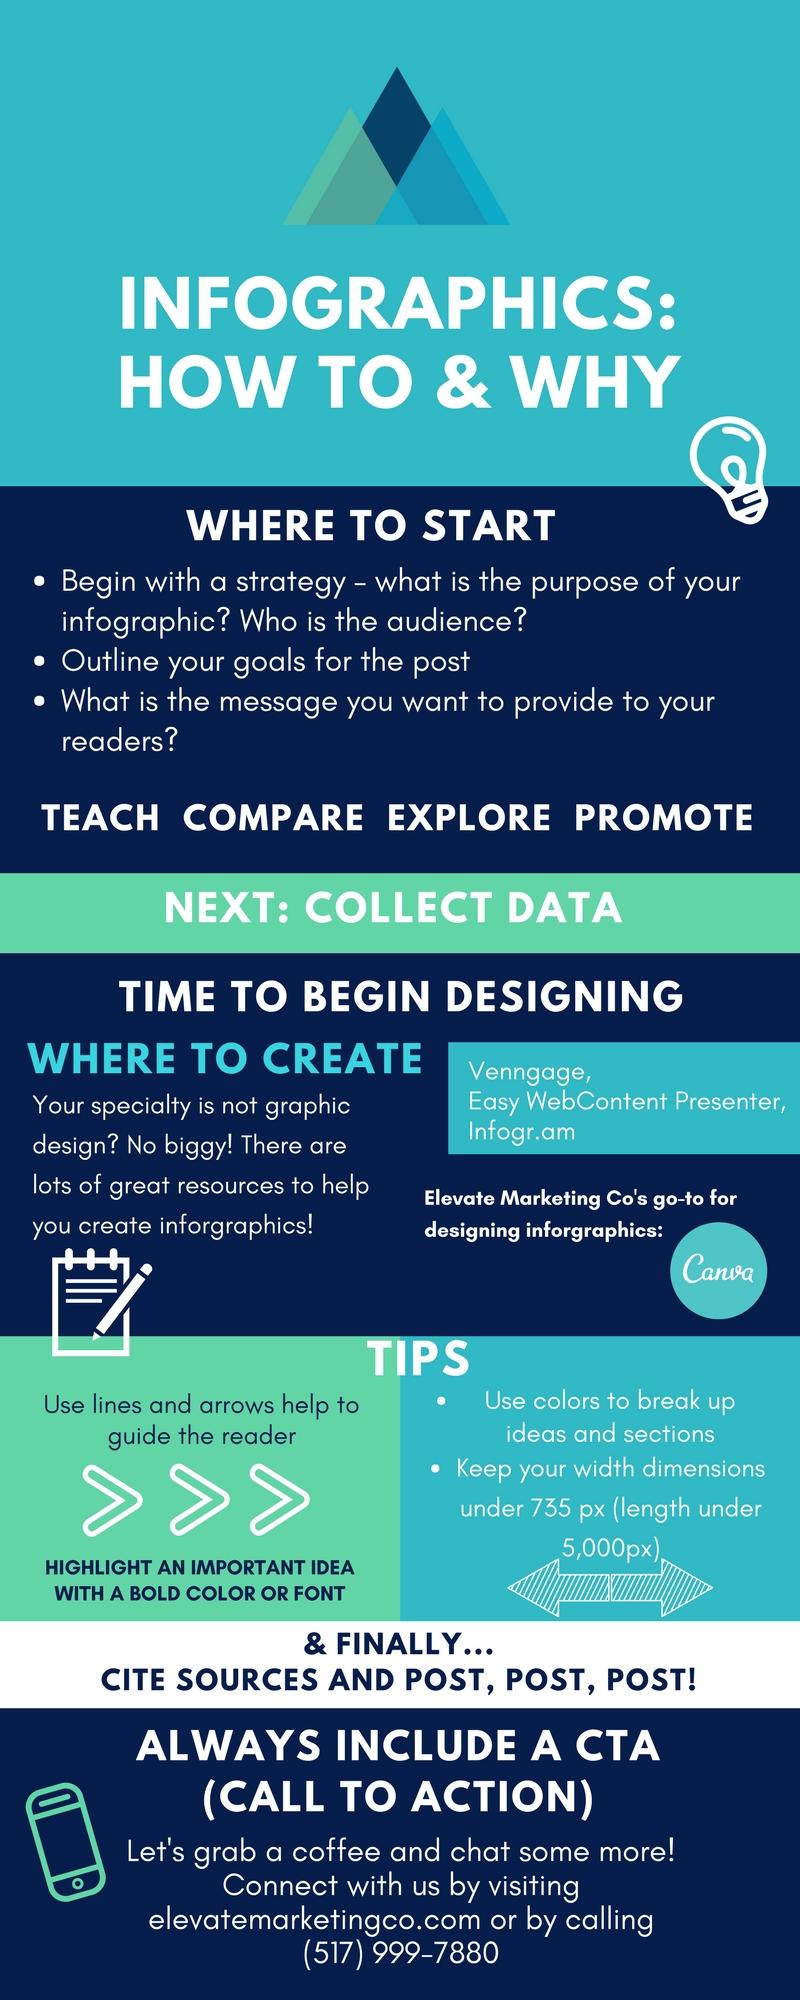 Elevate Infographic.jpg